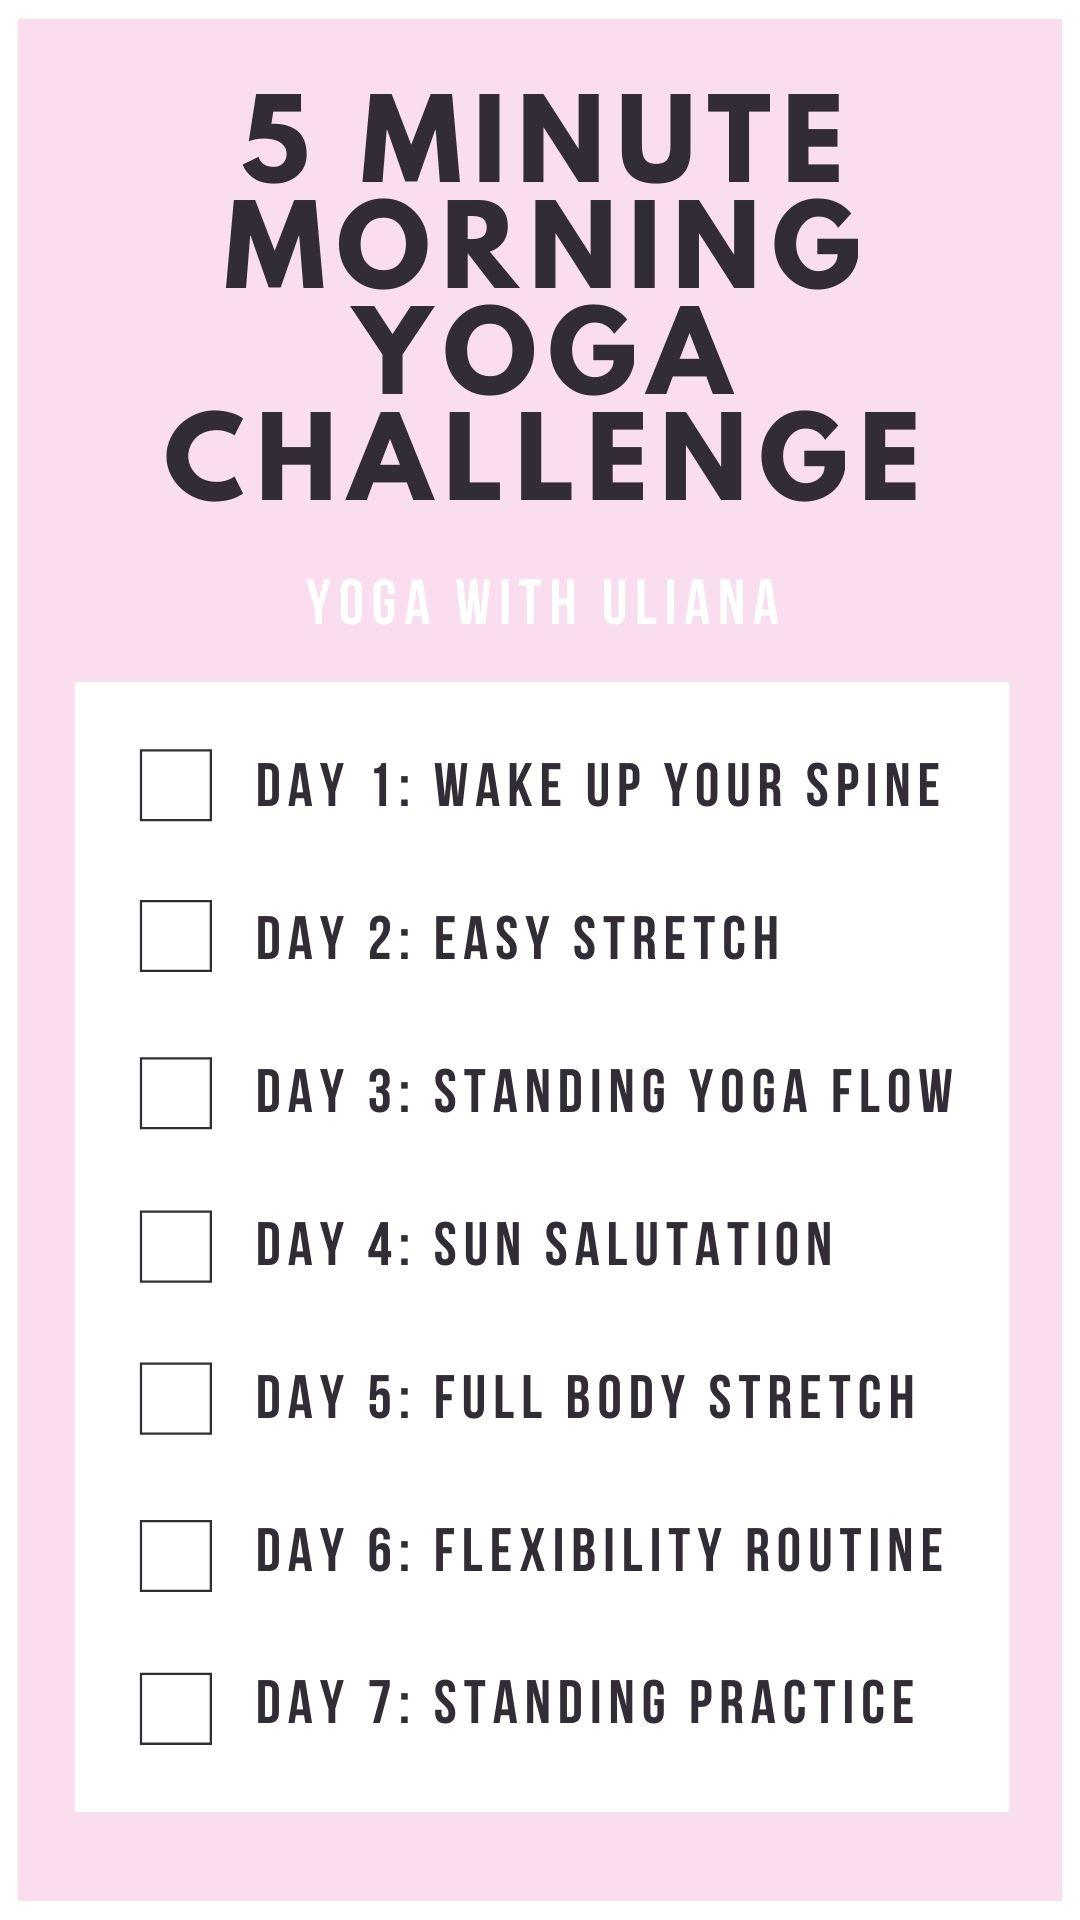 5 minute morning yoga challenge